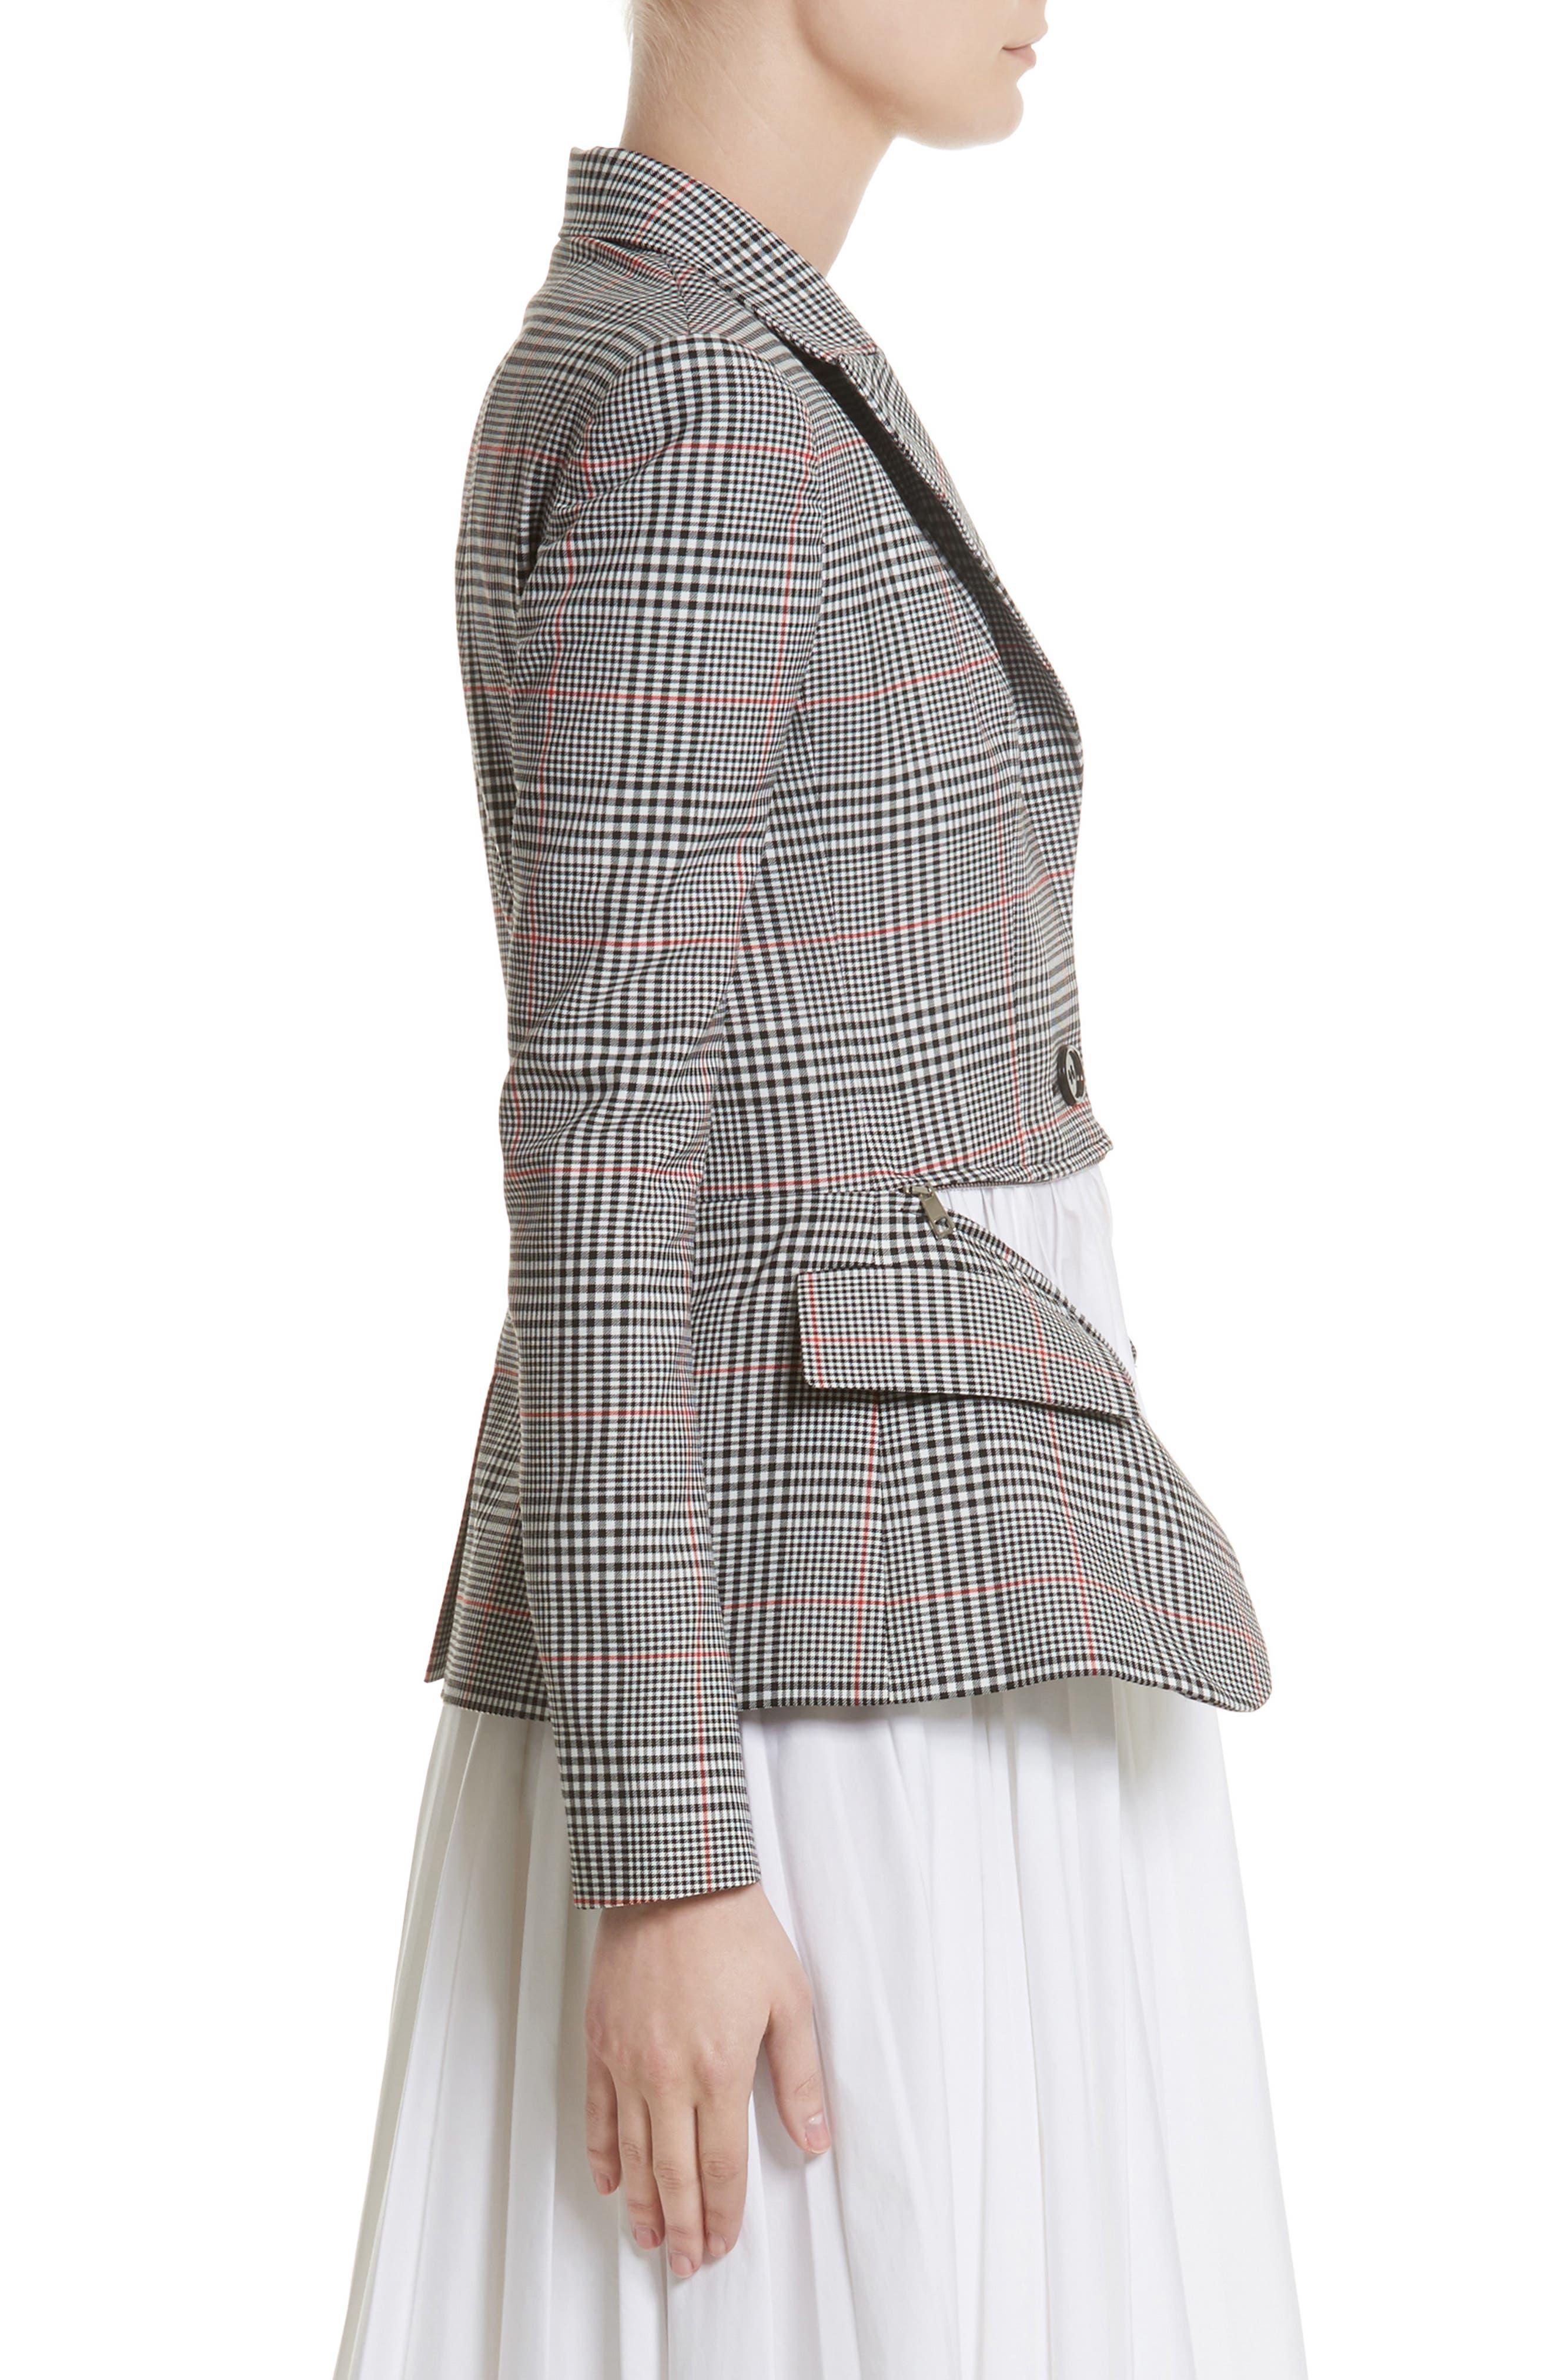 Glen Plaid Jacket Dress,                             Alternate thumbnail 4, color,                             Black